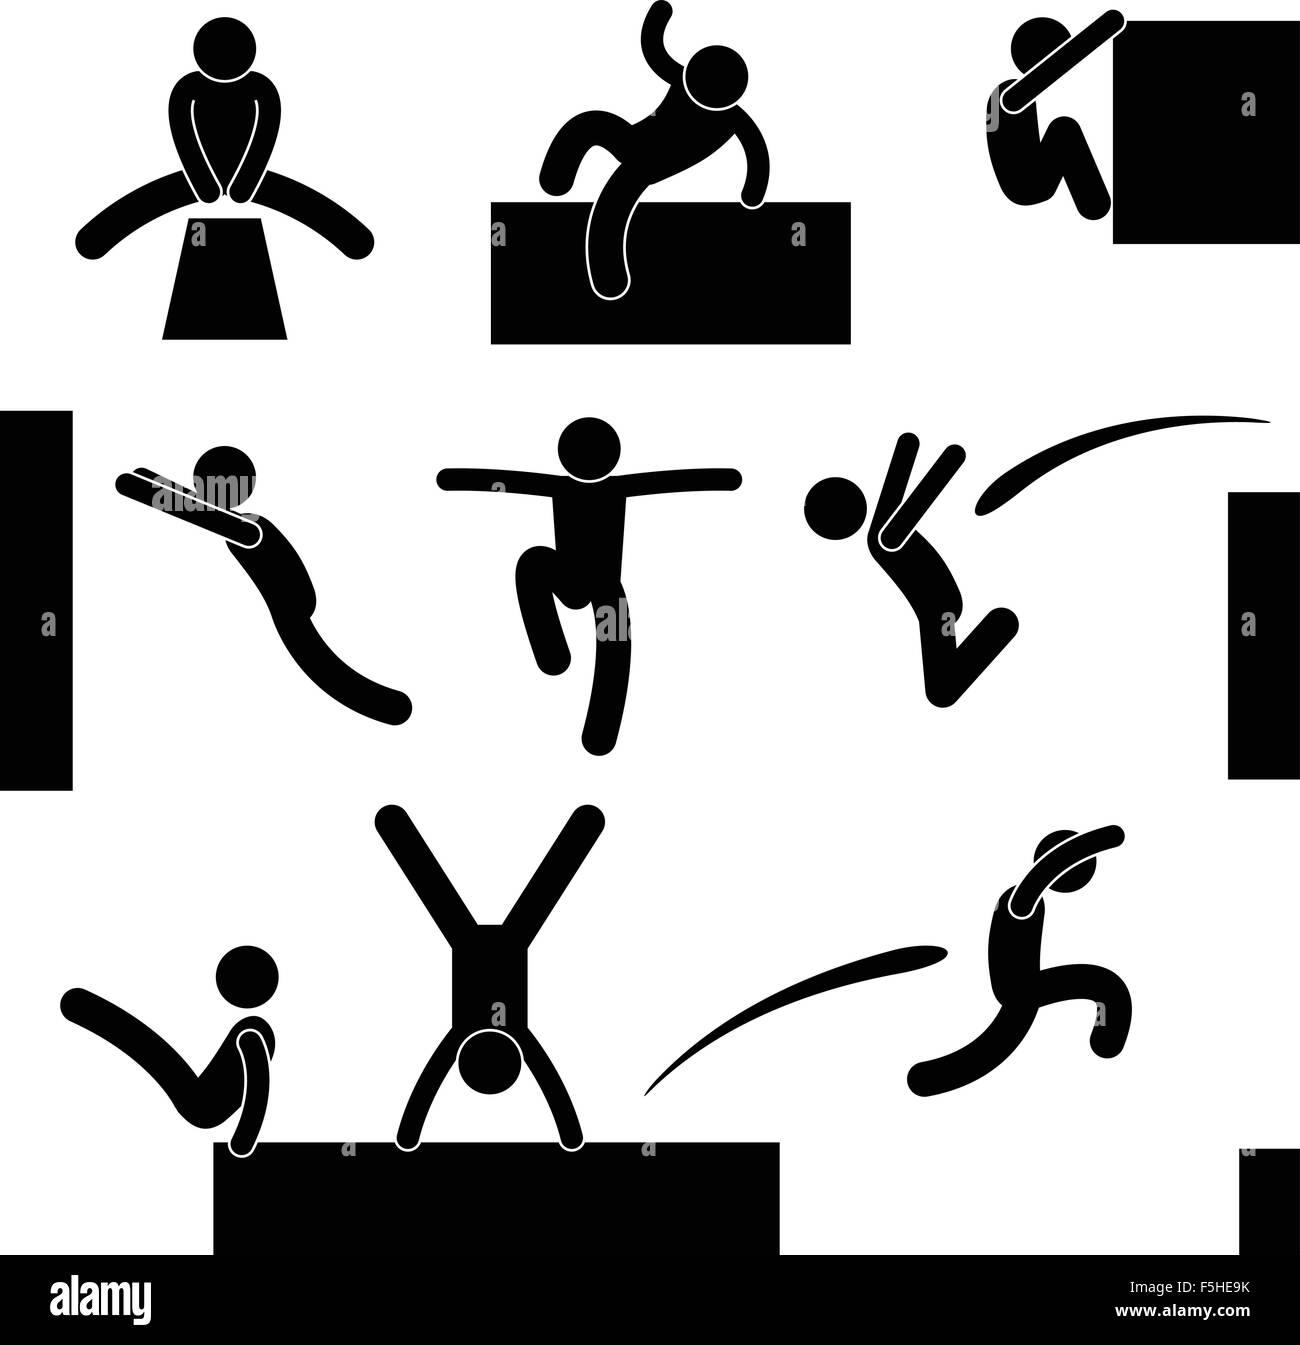 Parkour symbol wallpaper